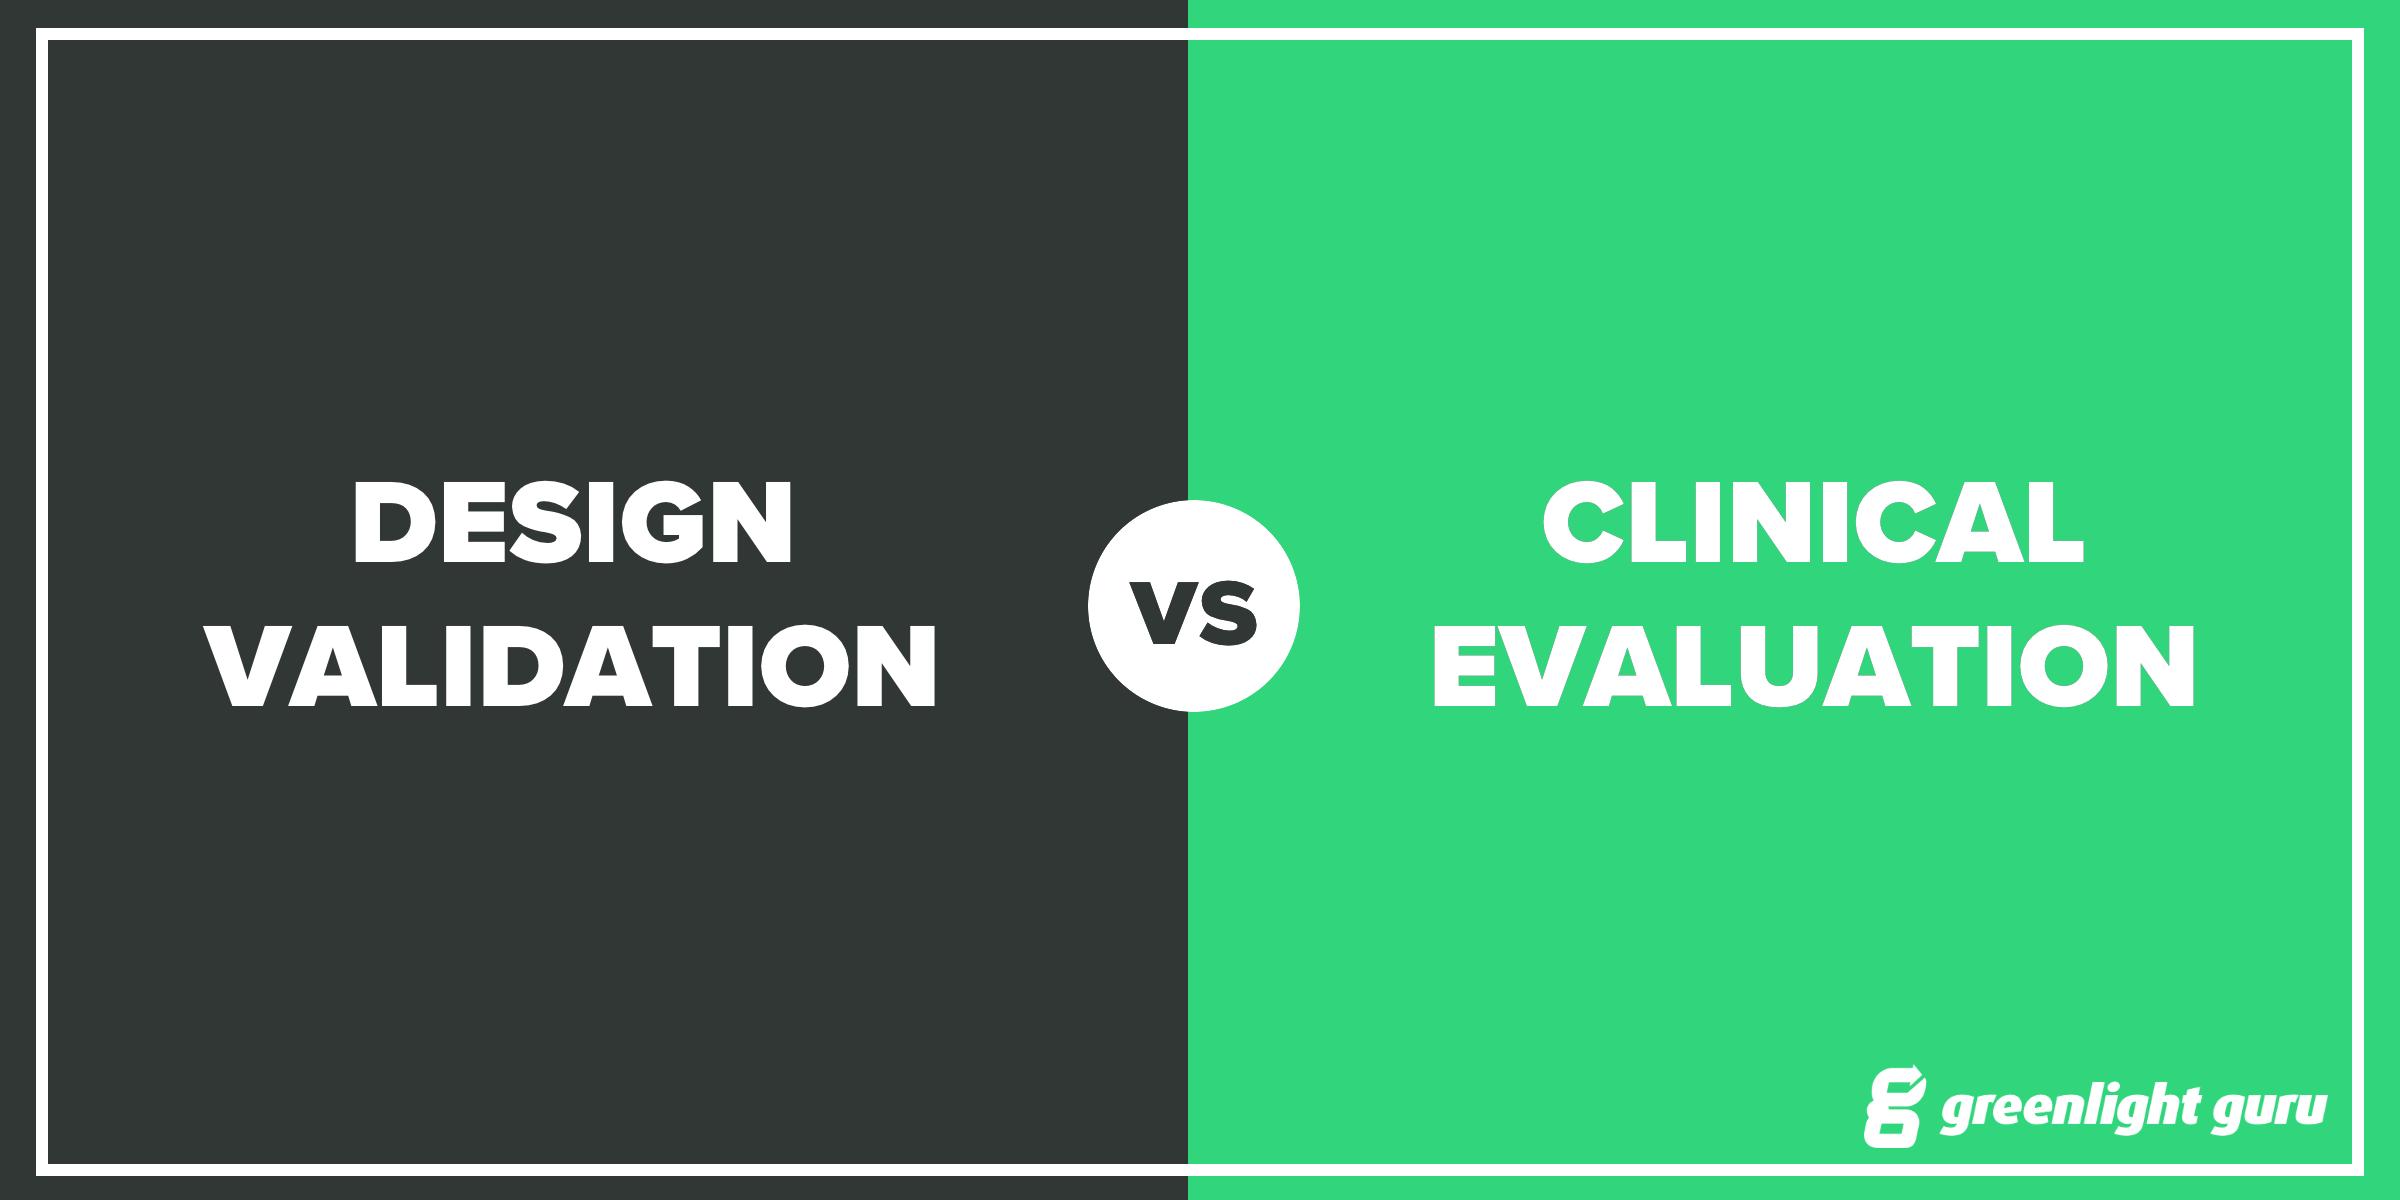 design validation vs clinical evaluation